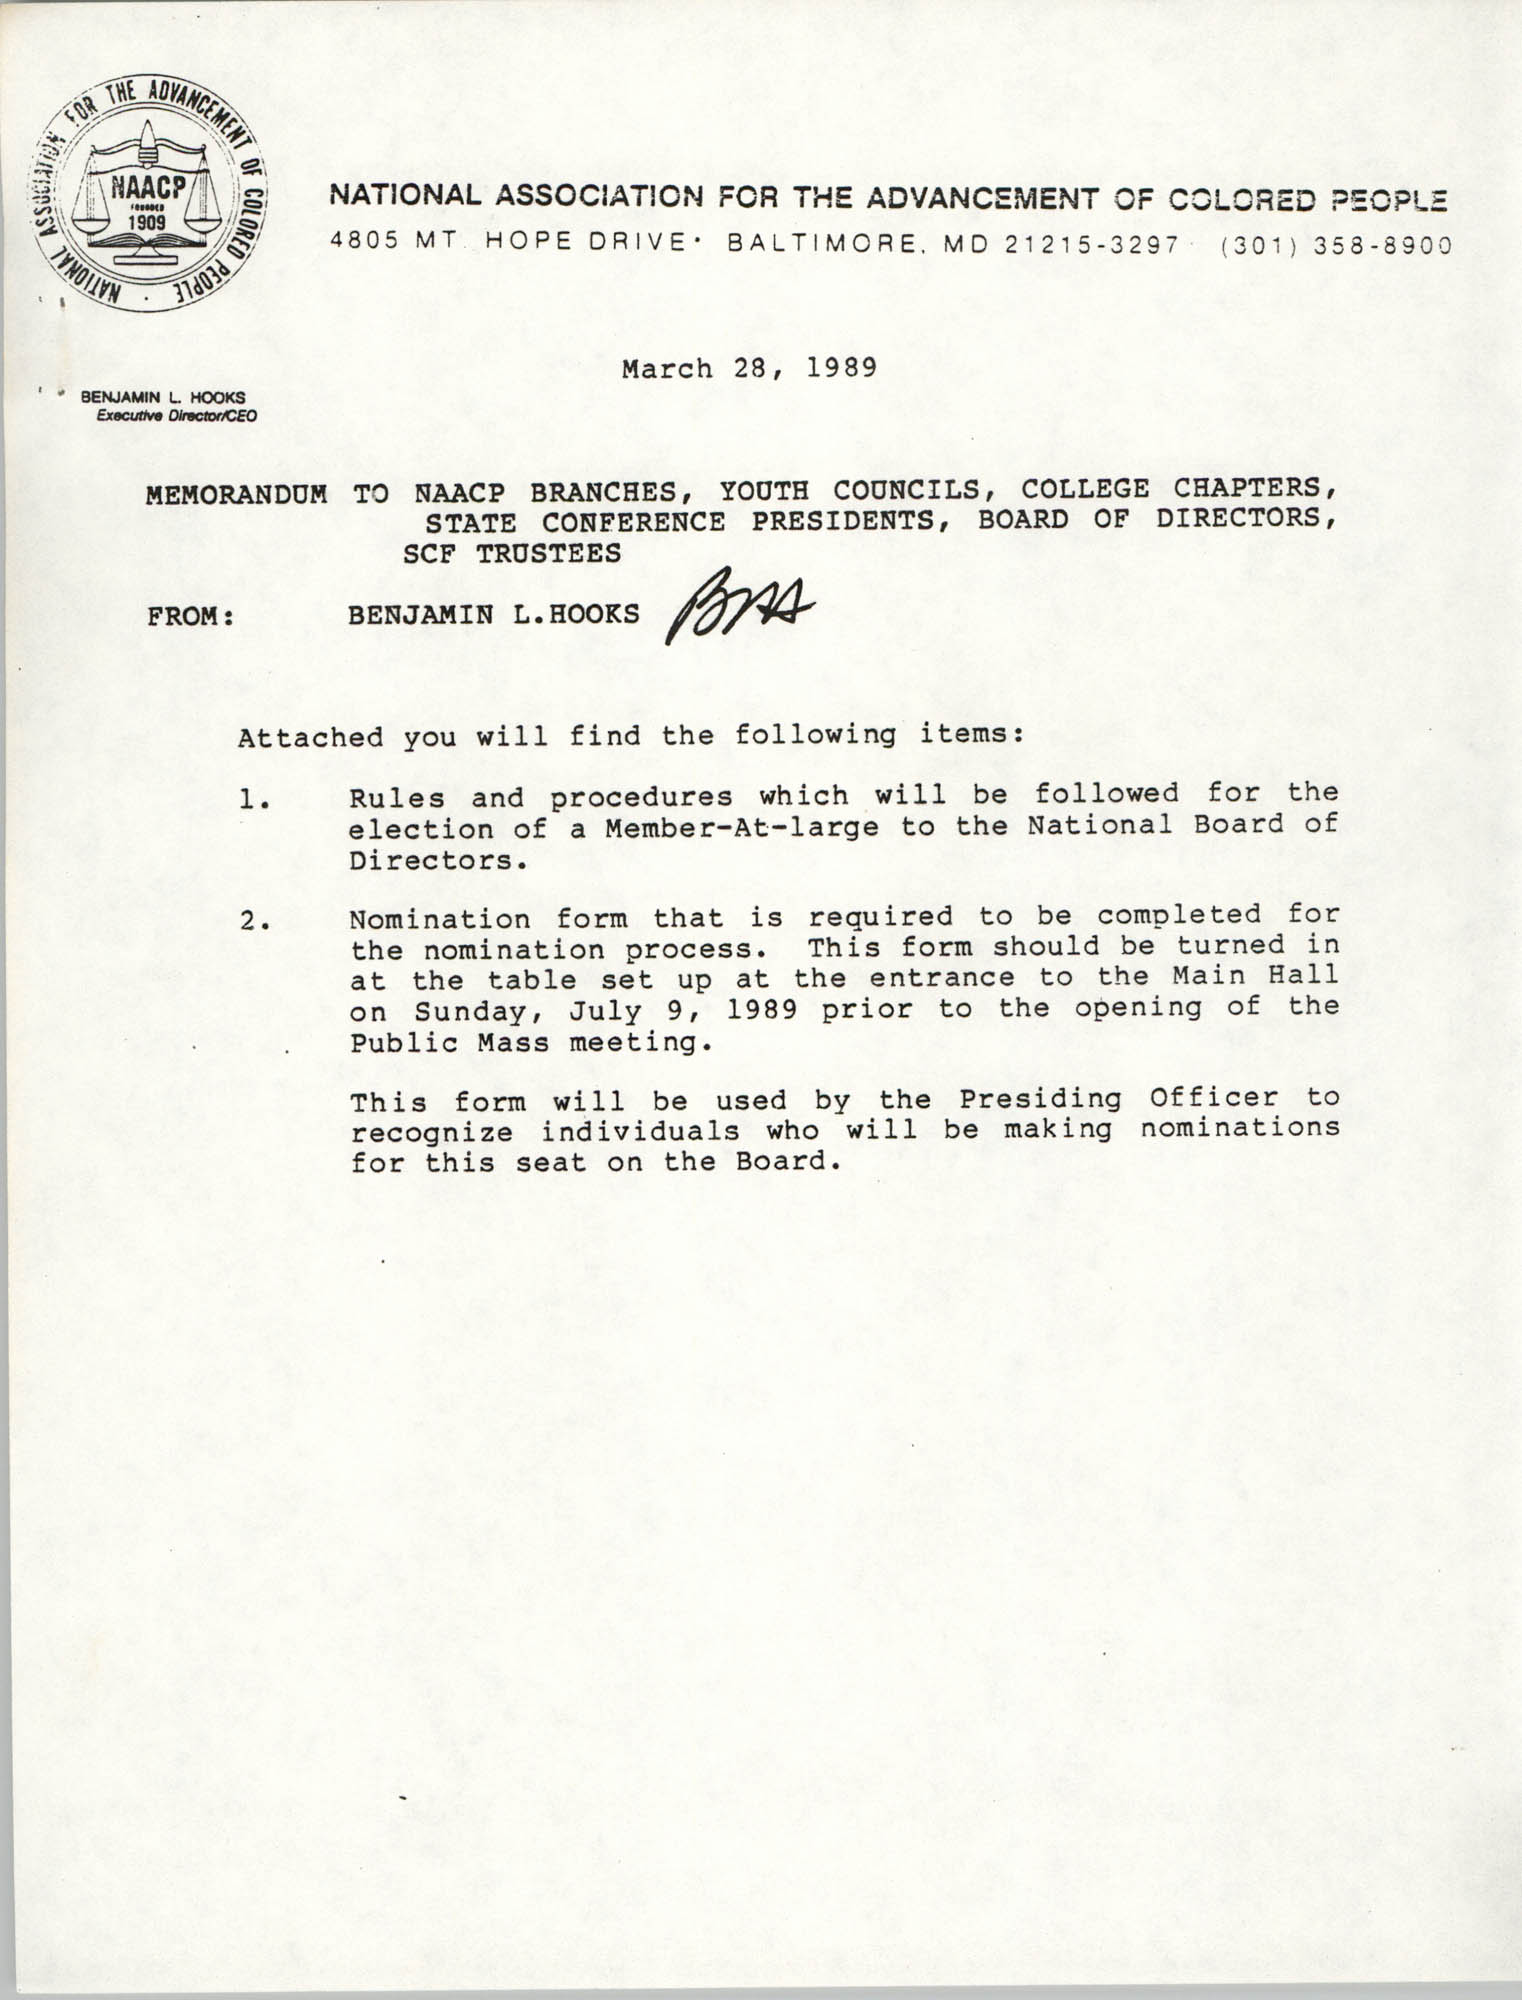 NAACP Memorandum, March 28, 1989